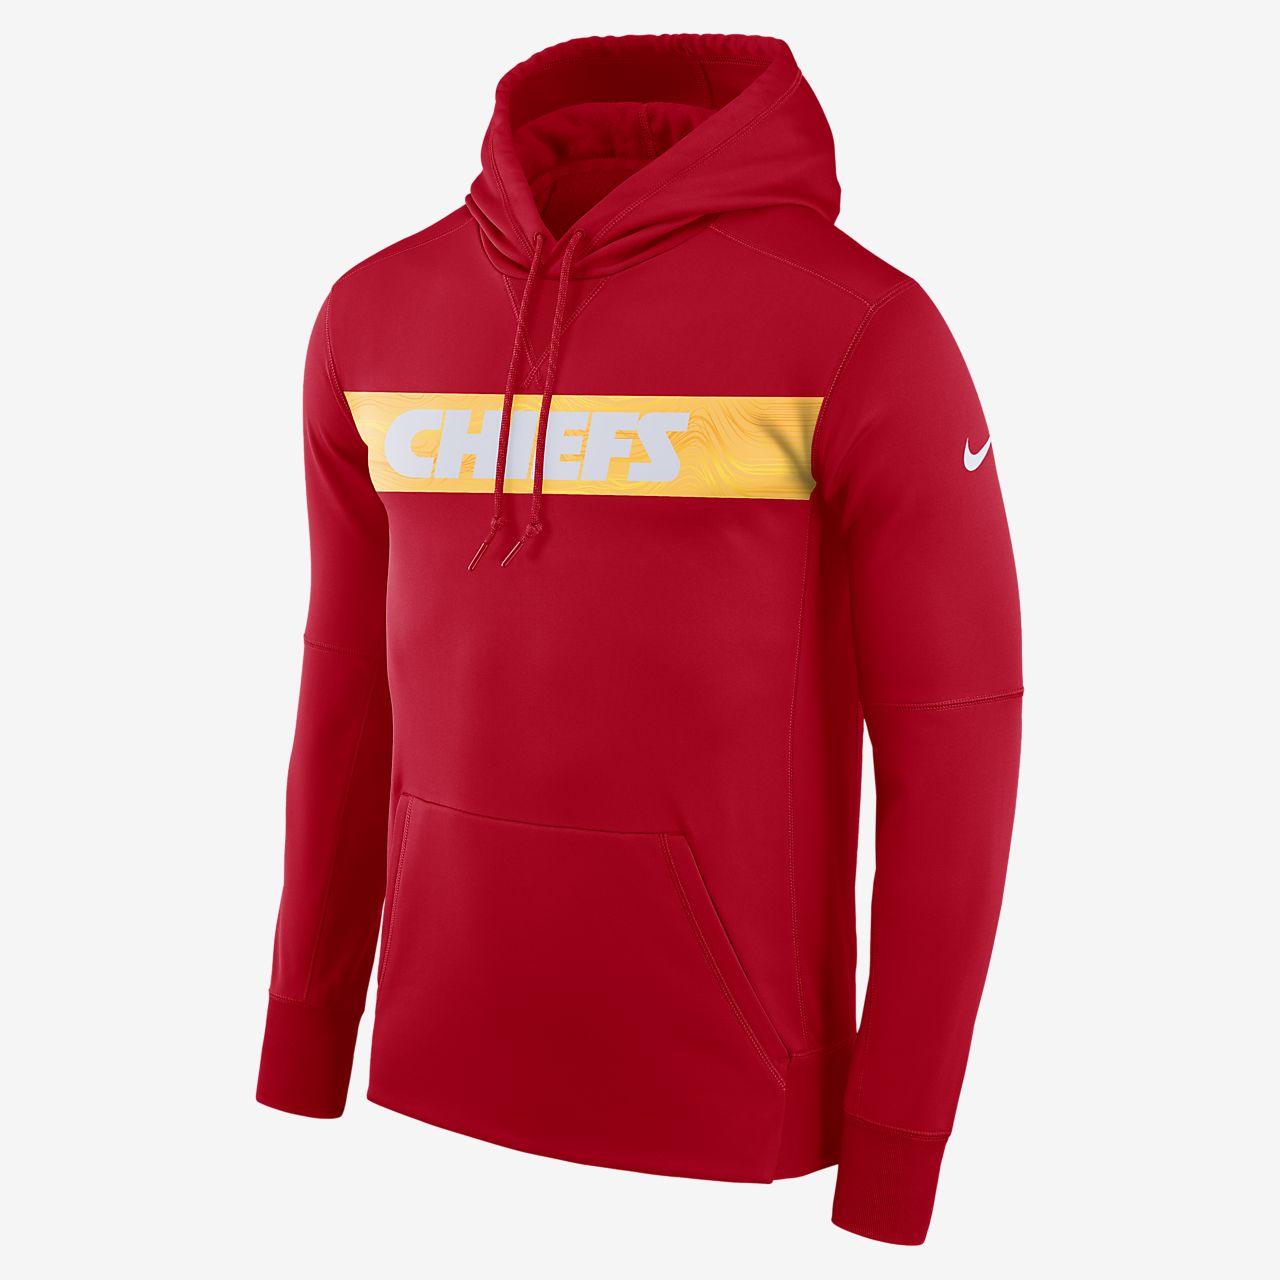 d950e4e52a08 Red Nike Sweatshirt Mens - BCD Tofu House